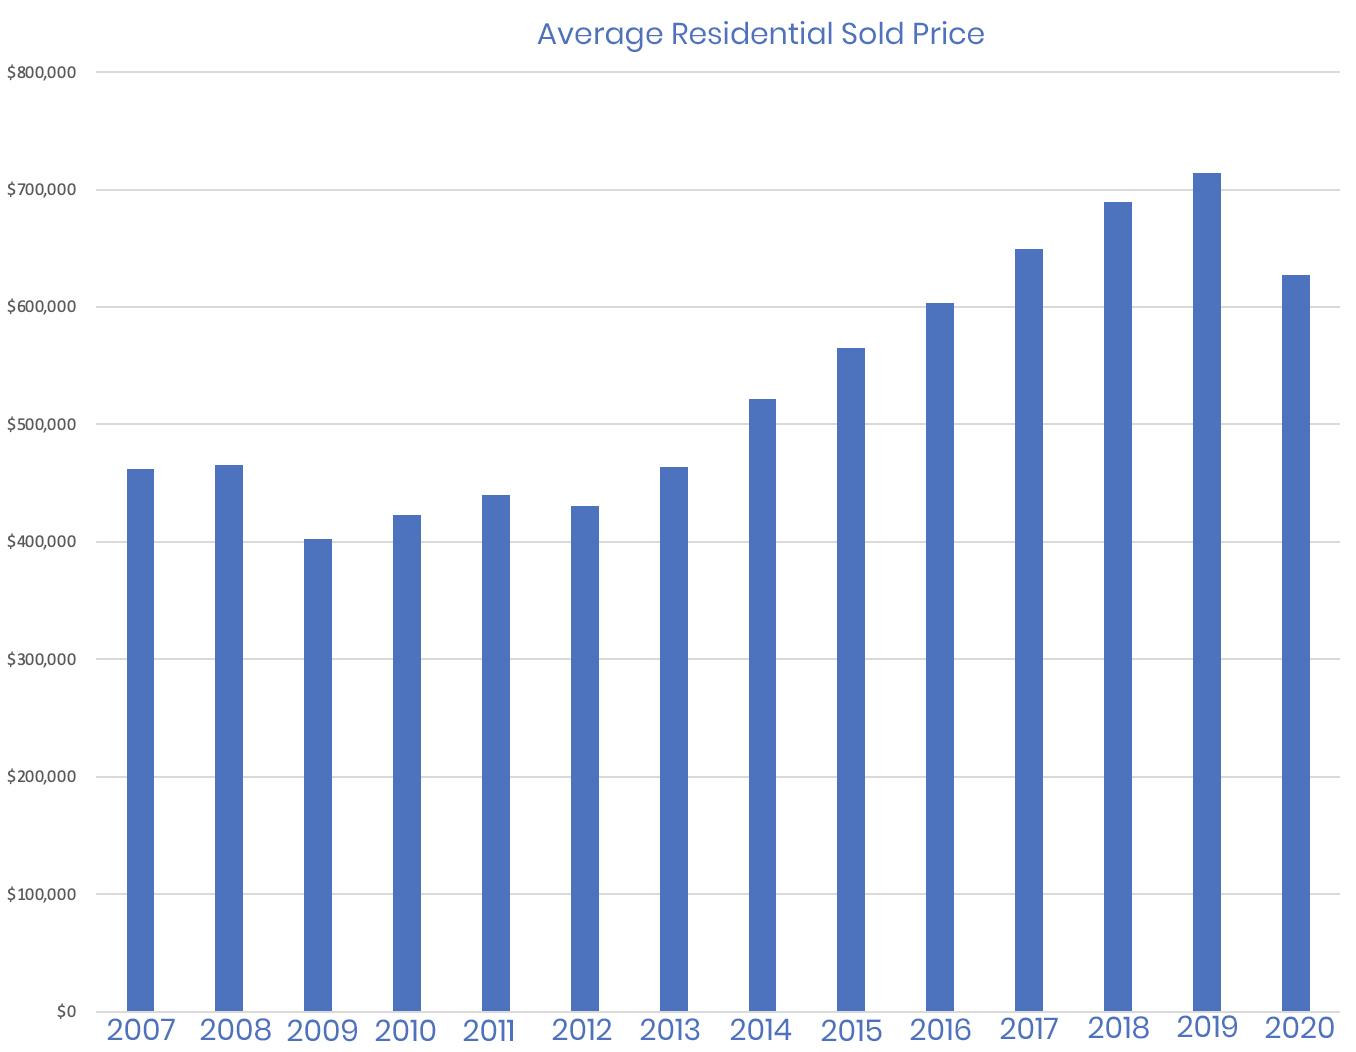 Average Residential Home Price in Central Park